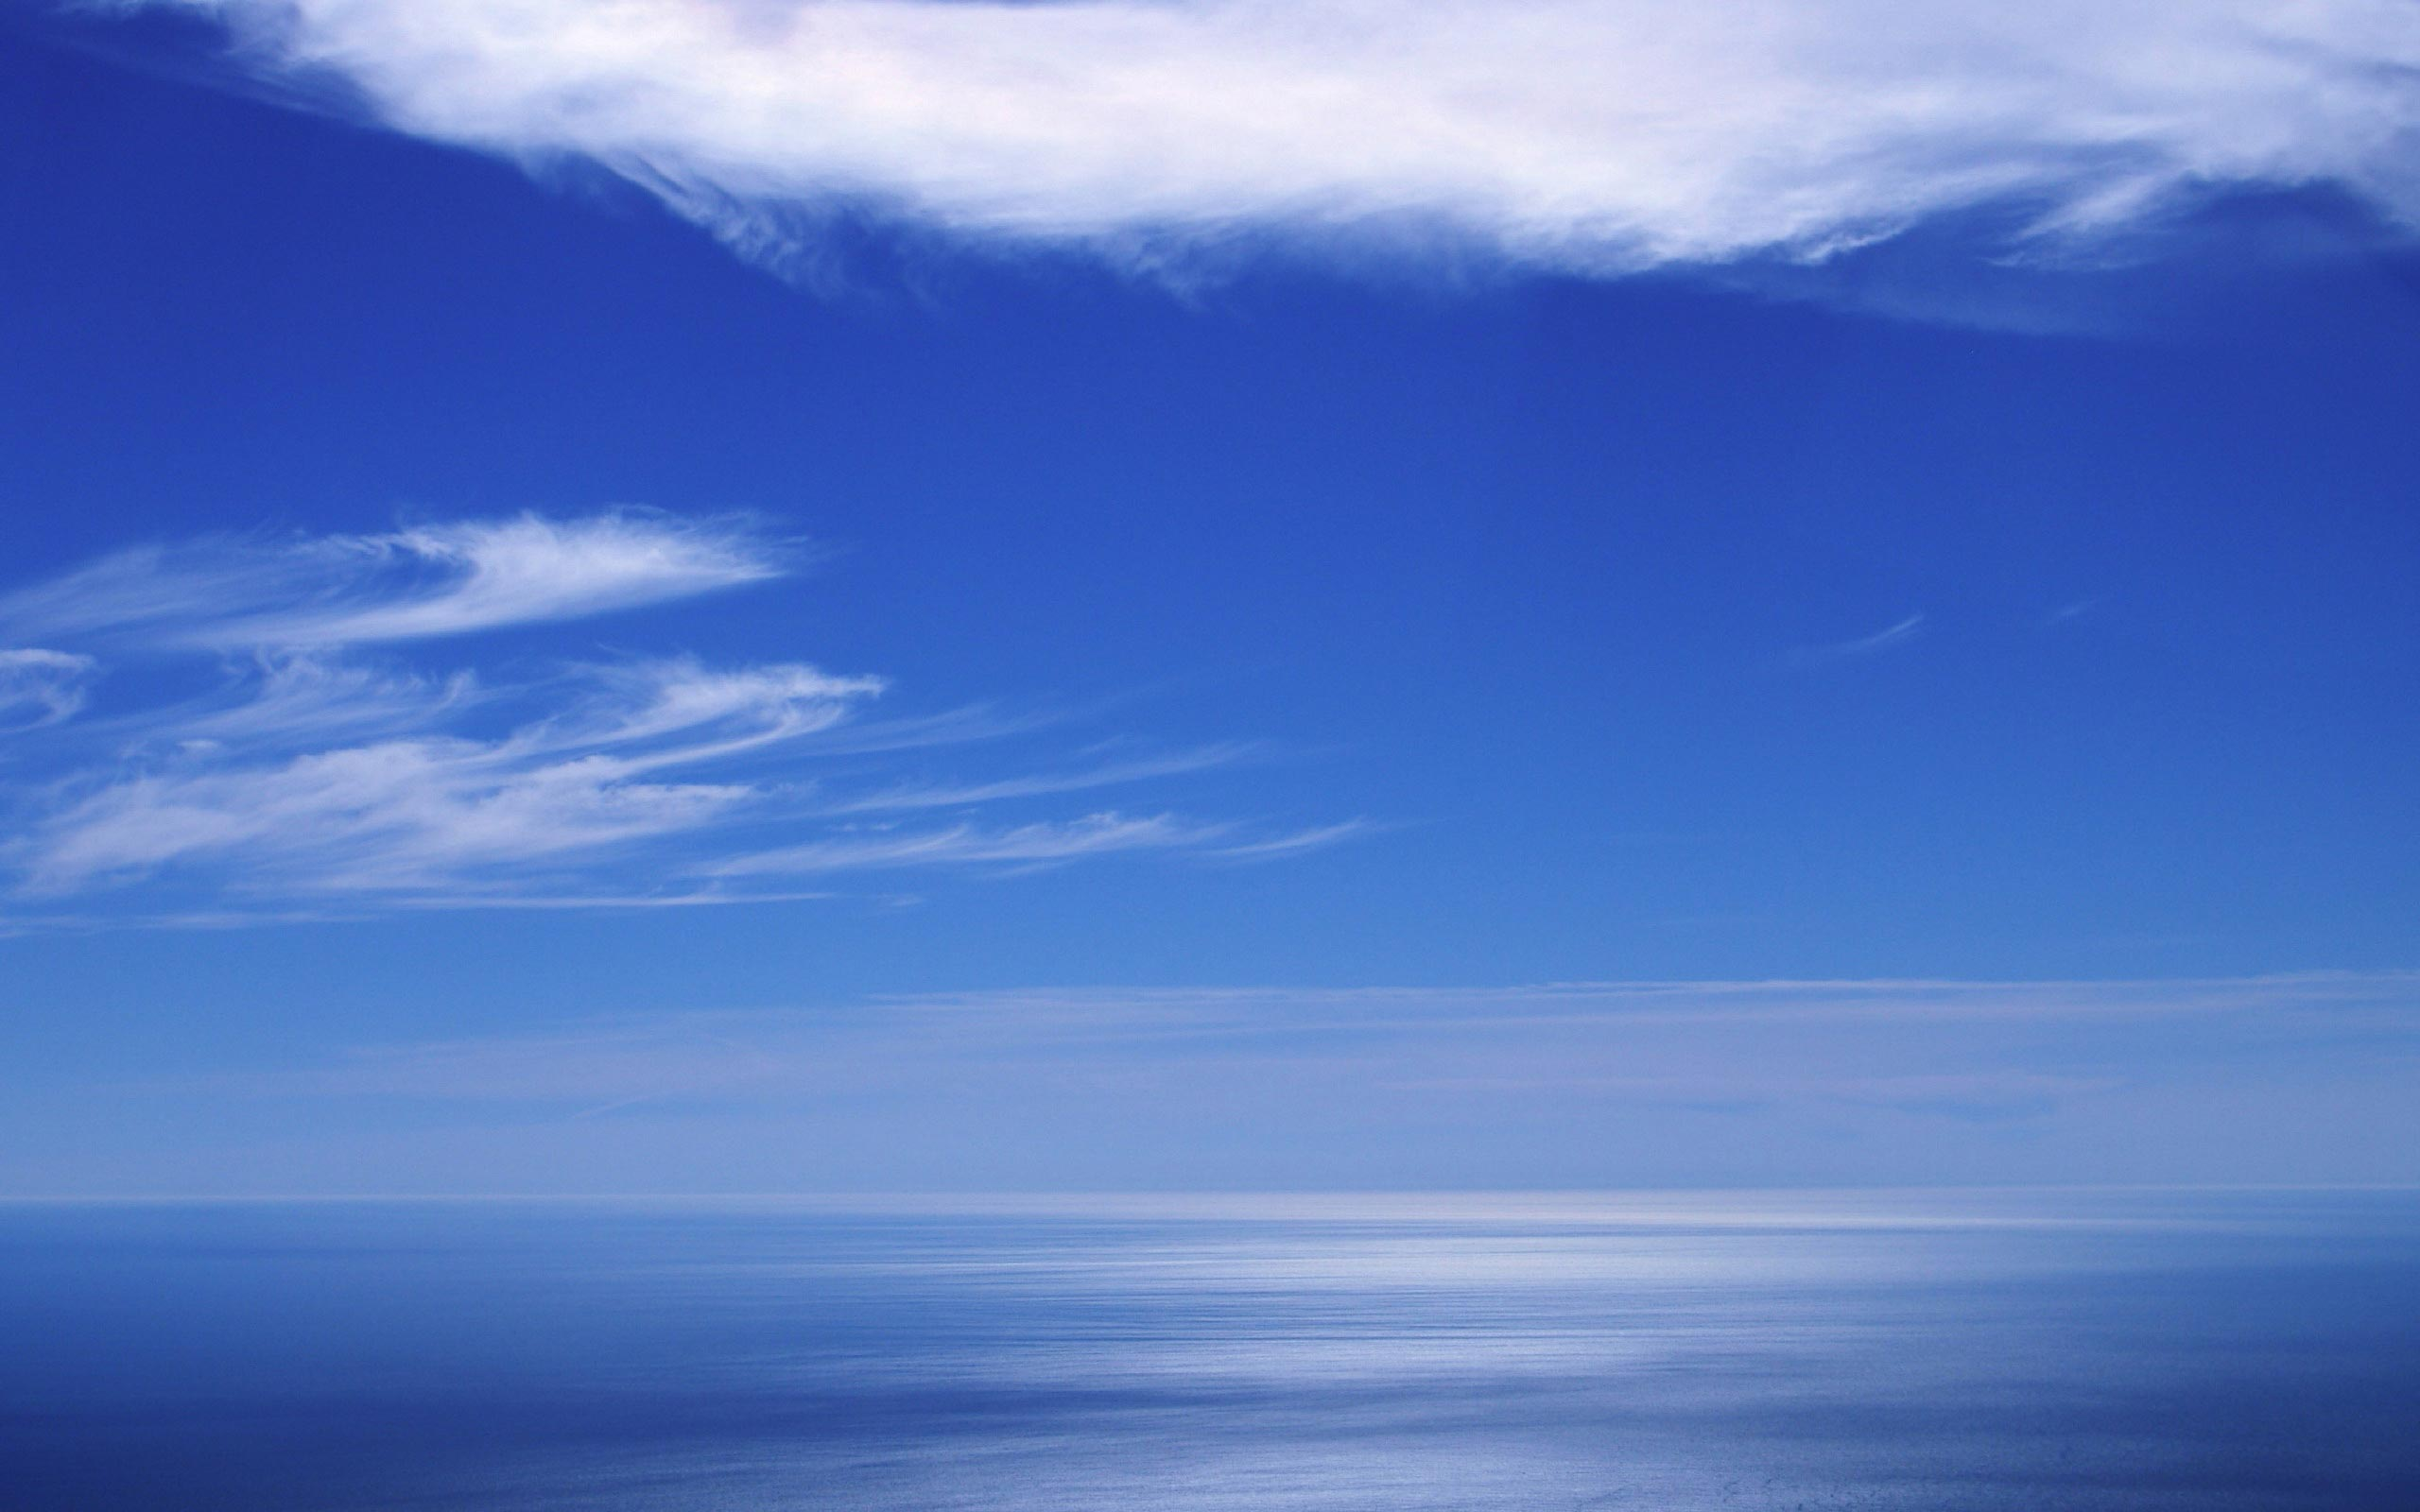 sky wallpaper blue